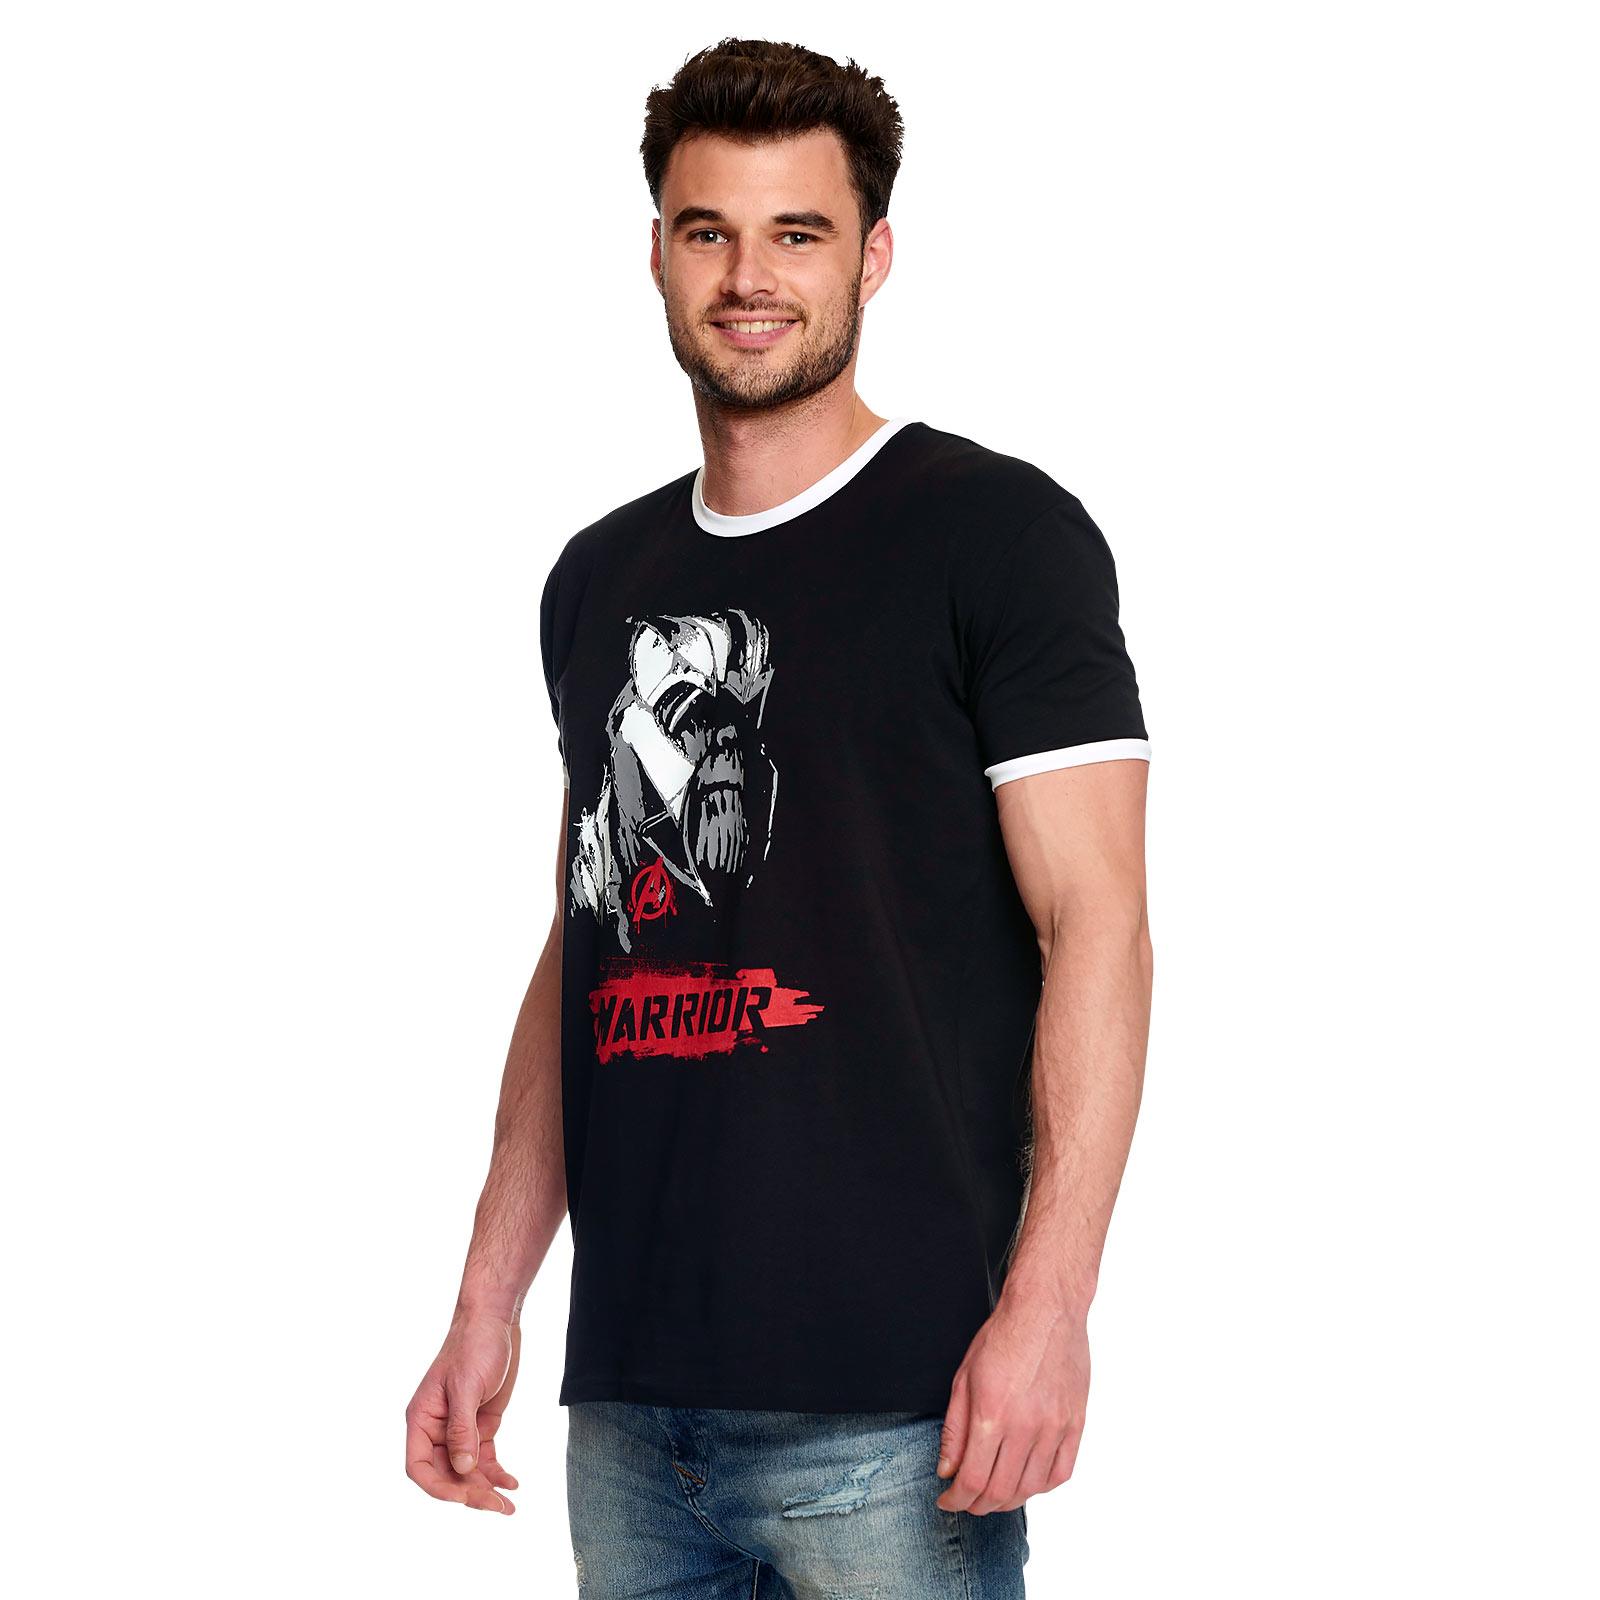 Avengers - Thanos Warrior T-Shirt schwarz